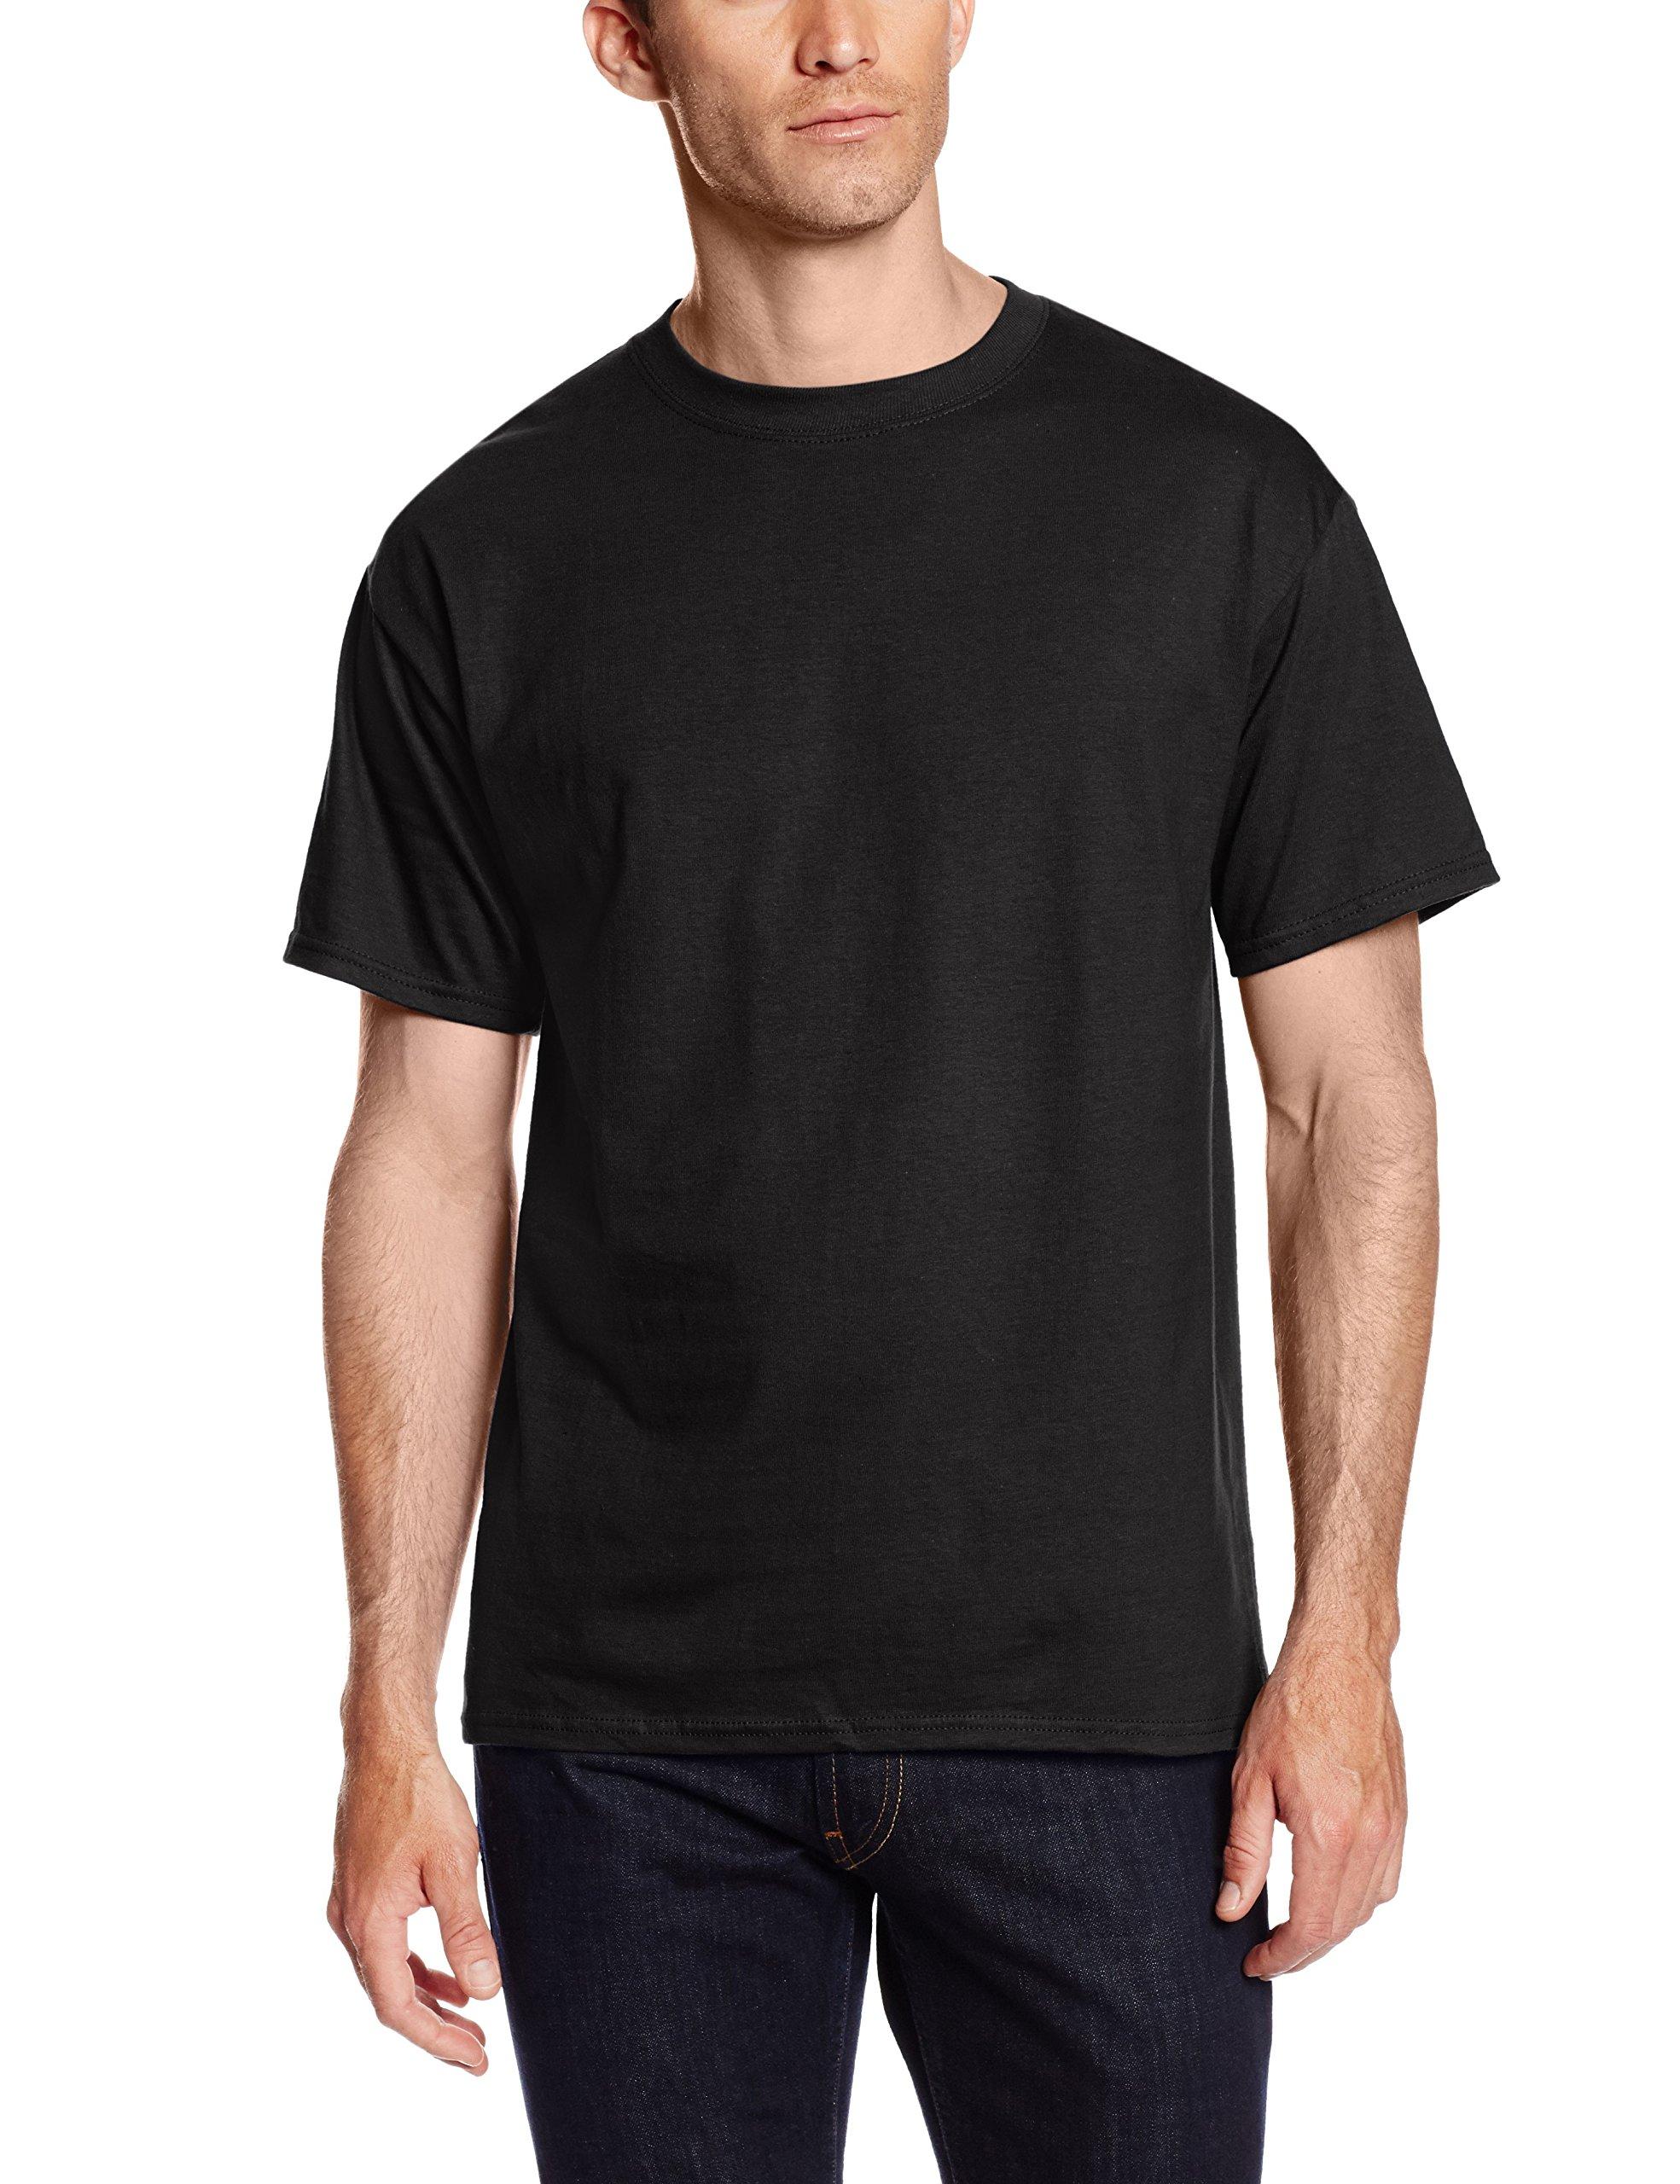 Hanes Men's Short Sleeve Beefy-T (Pack of 2), Black, Large by Hanes (Image #1)